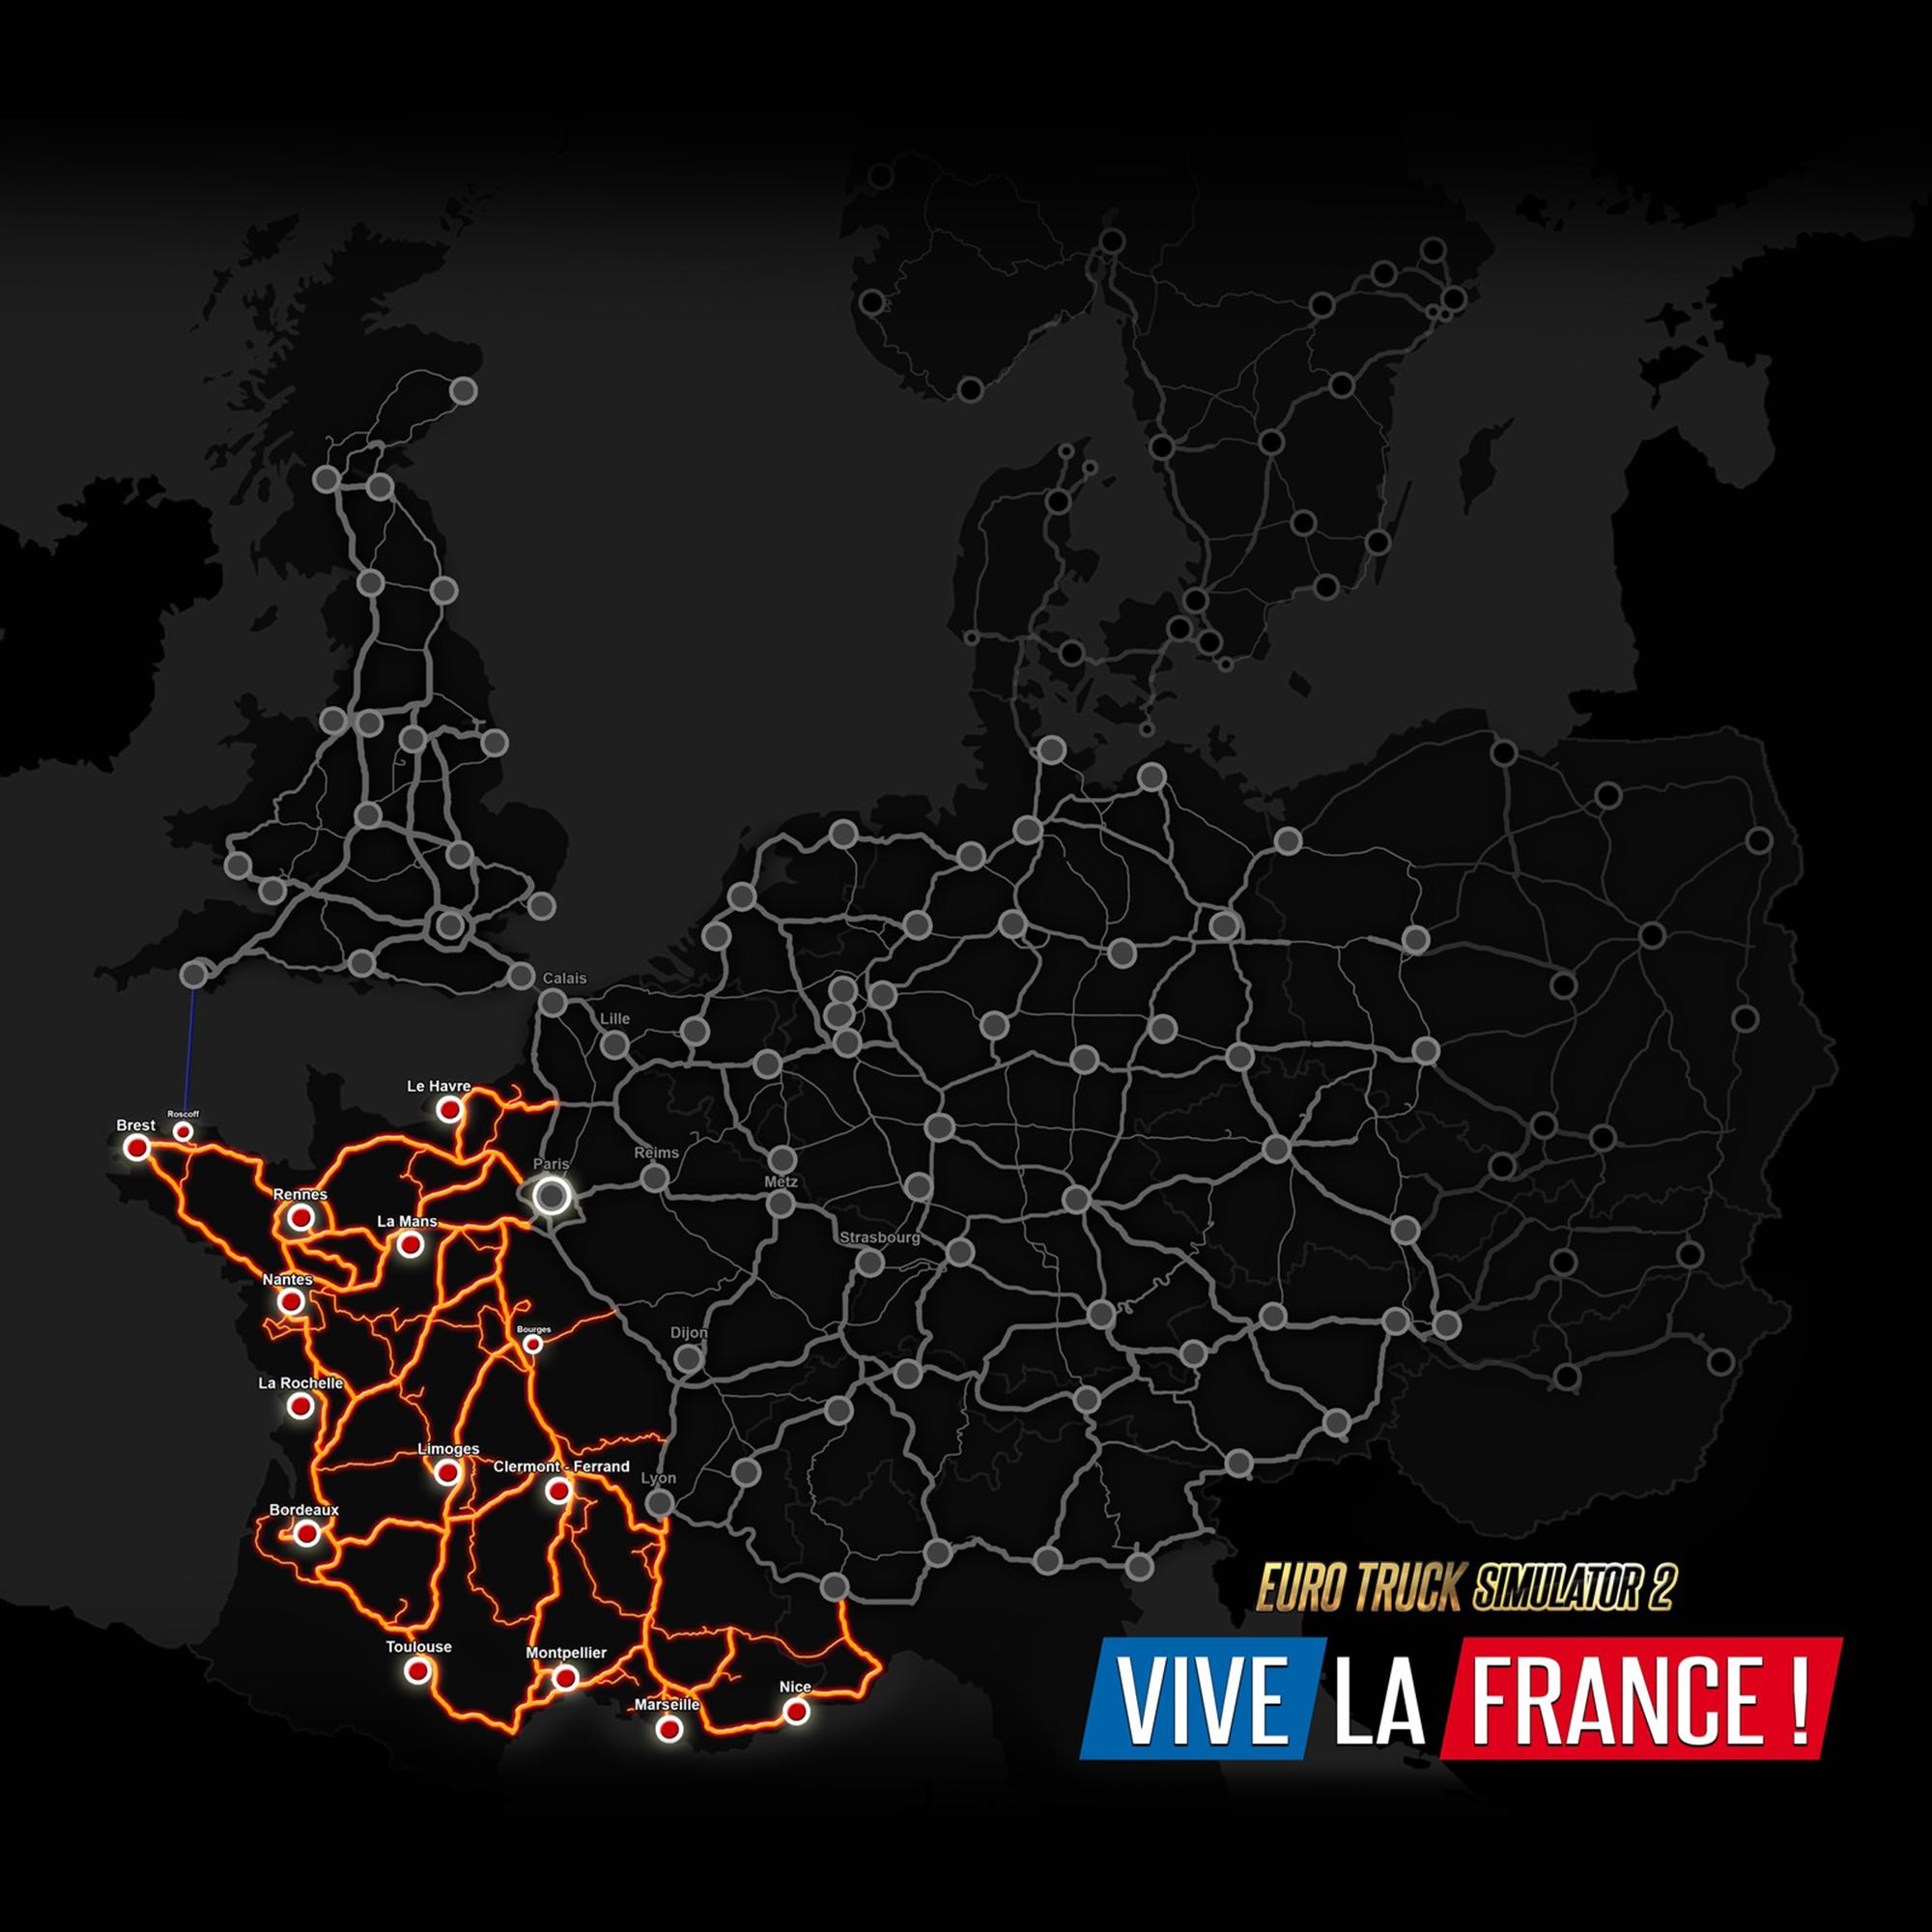 Euro Truck Simulator 2 - Vive La France (PC) (Digital Download)